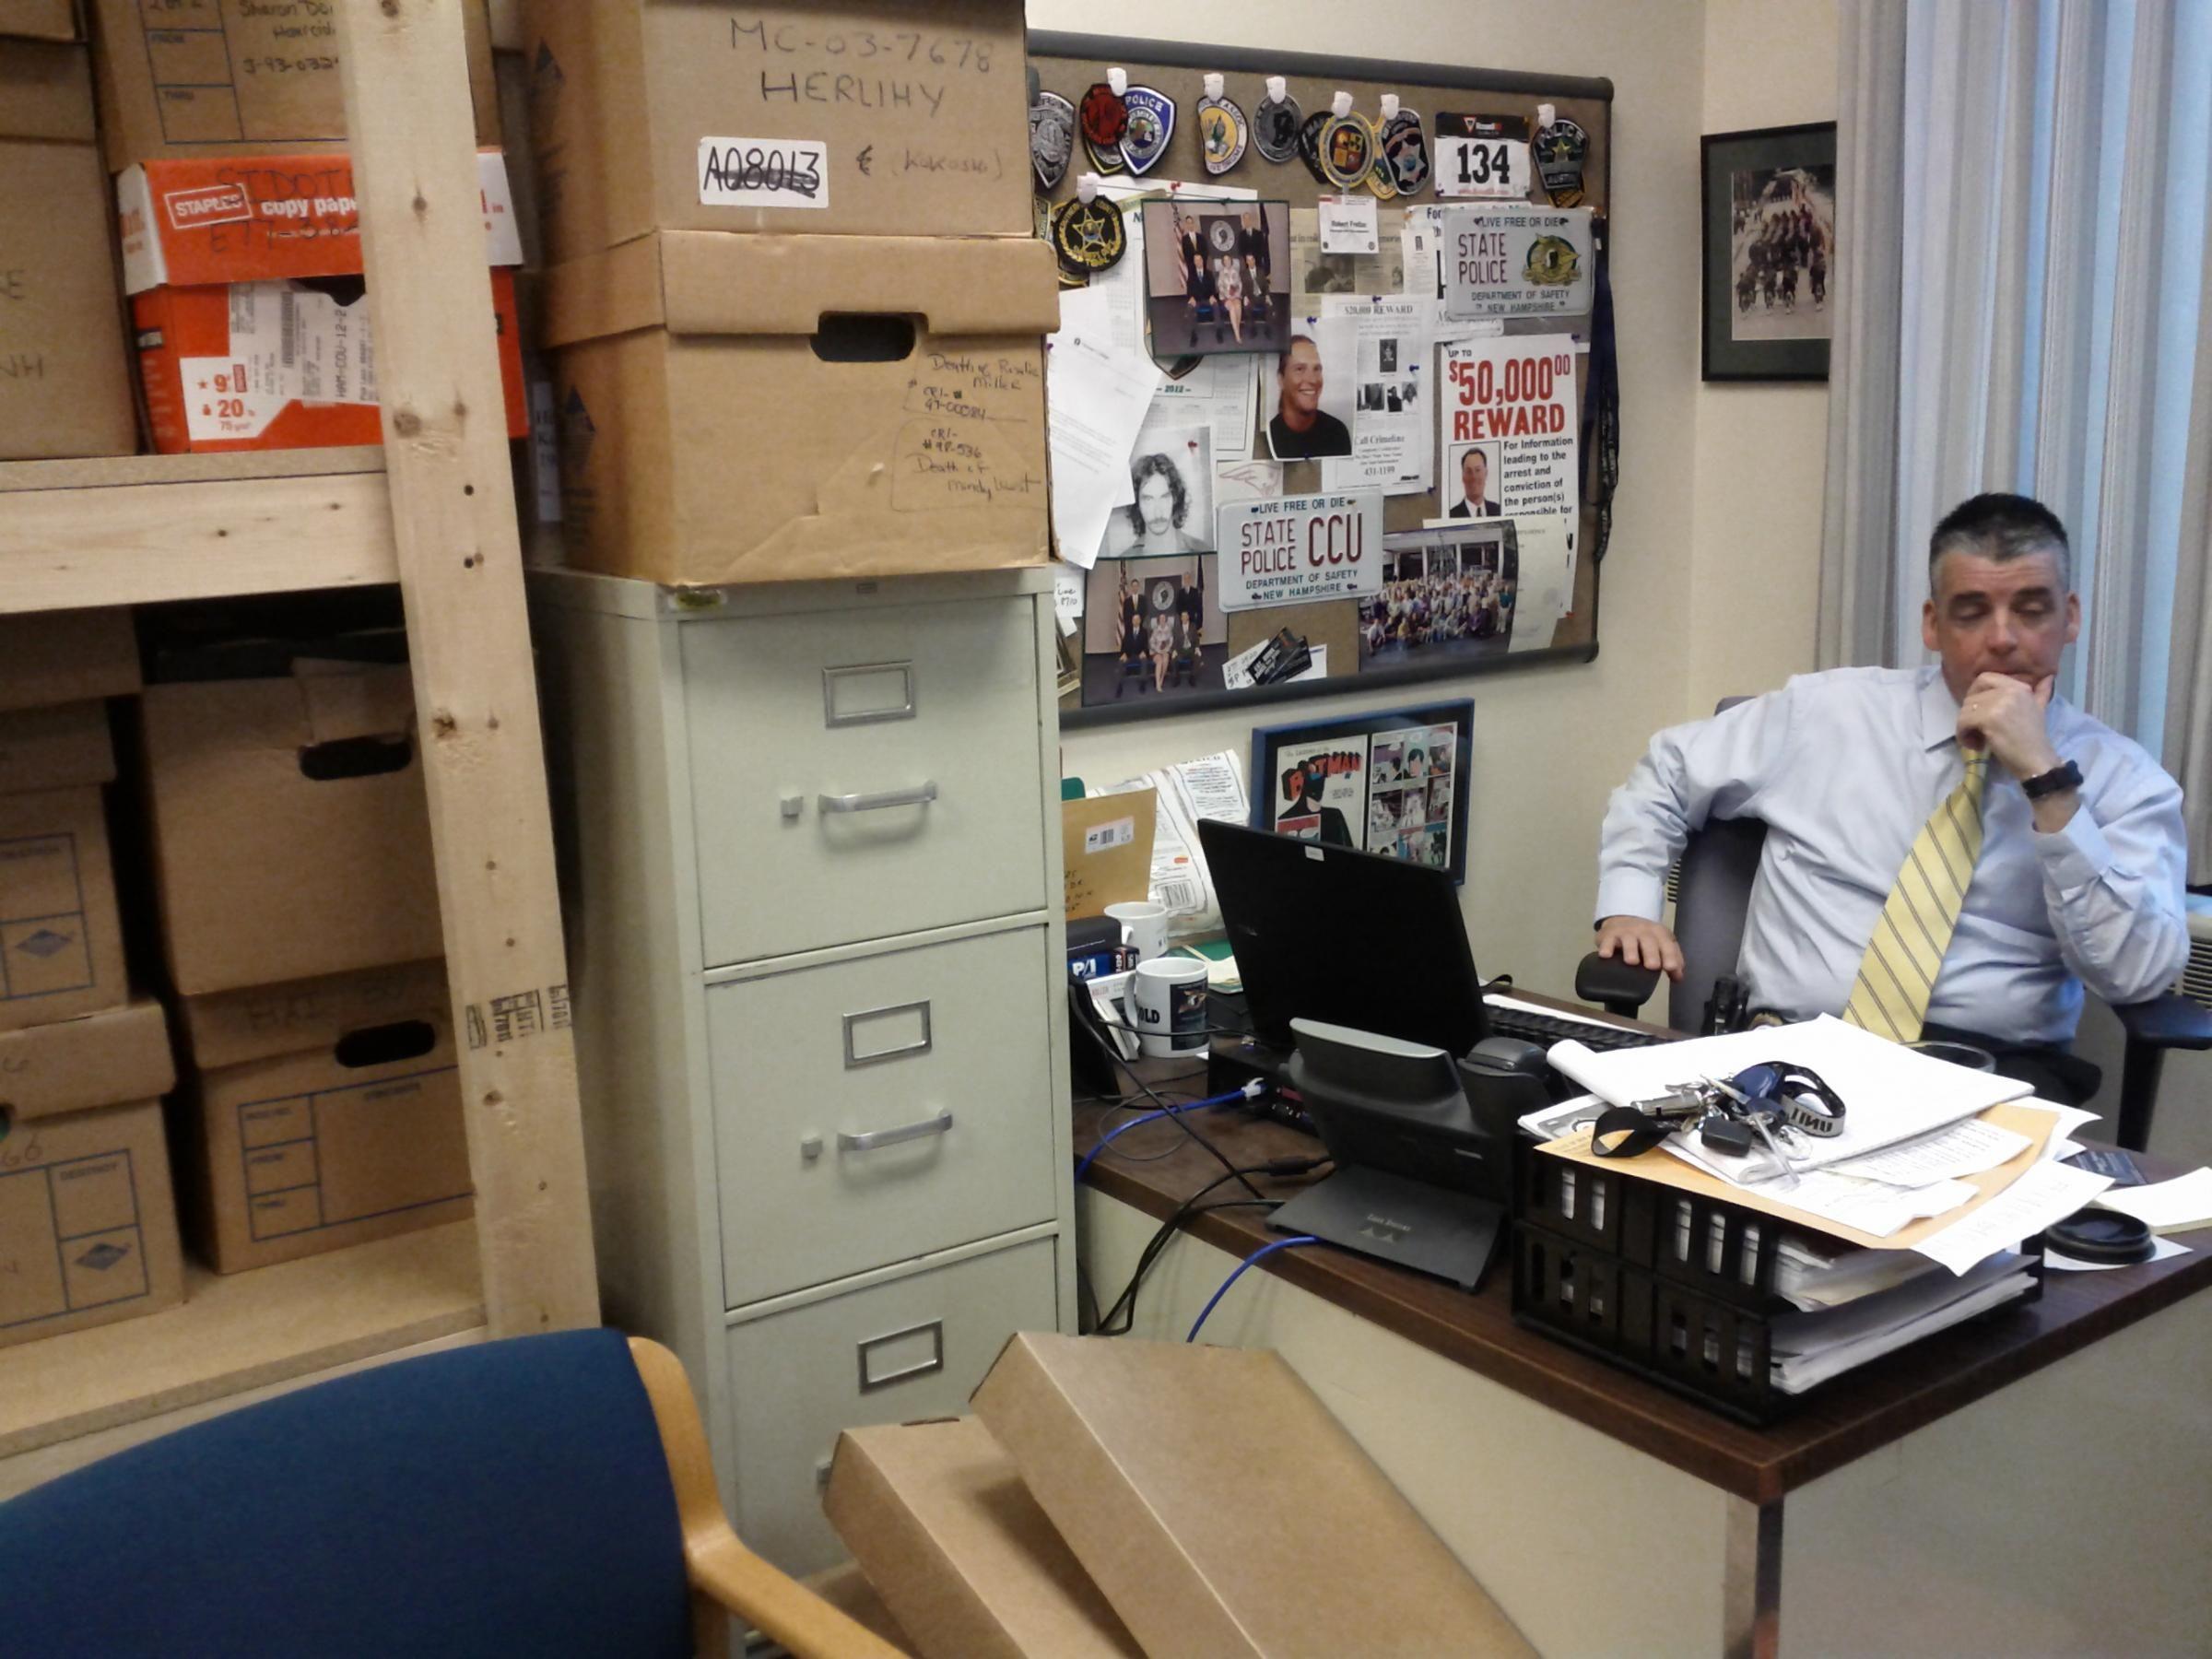 Pin by Natt Bayona on PIGMENTOO | Desk, Police detective, Police ...